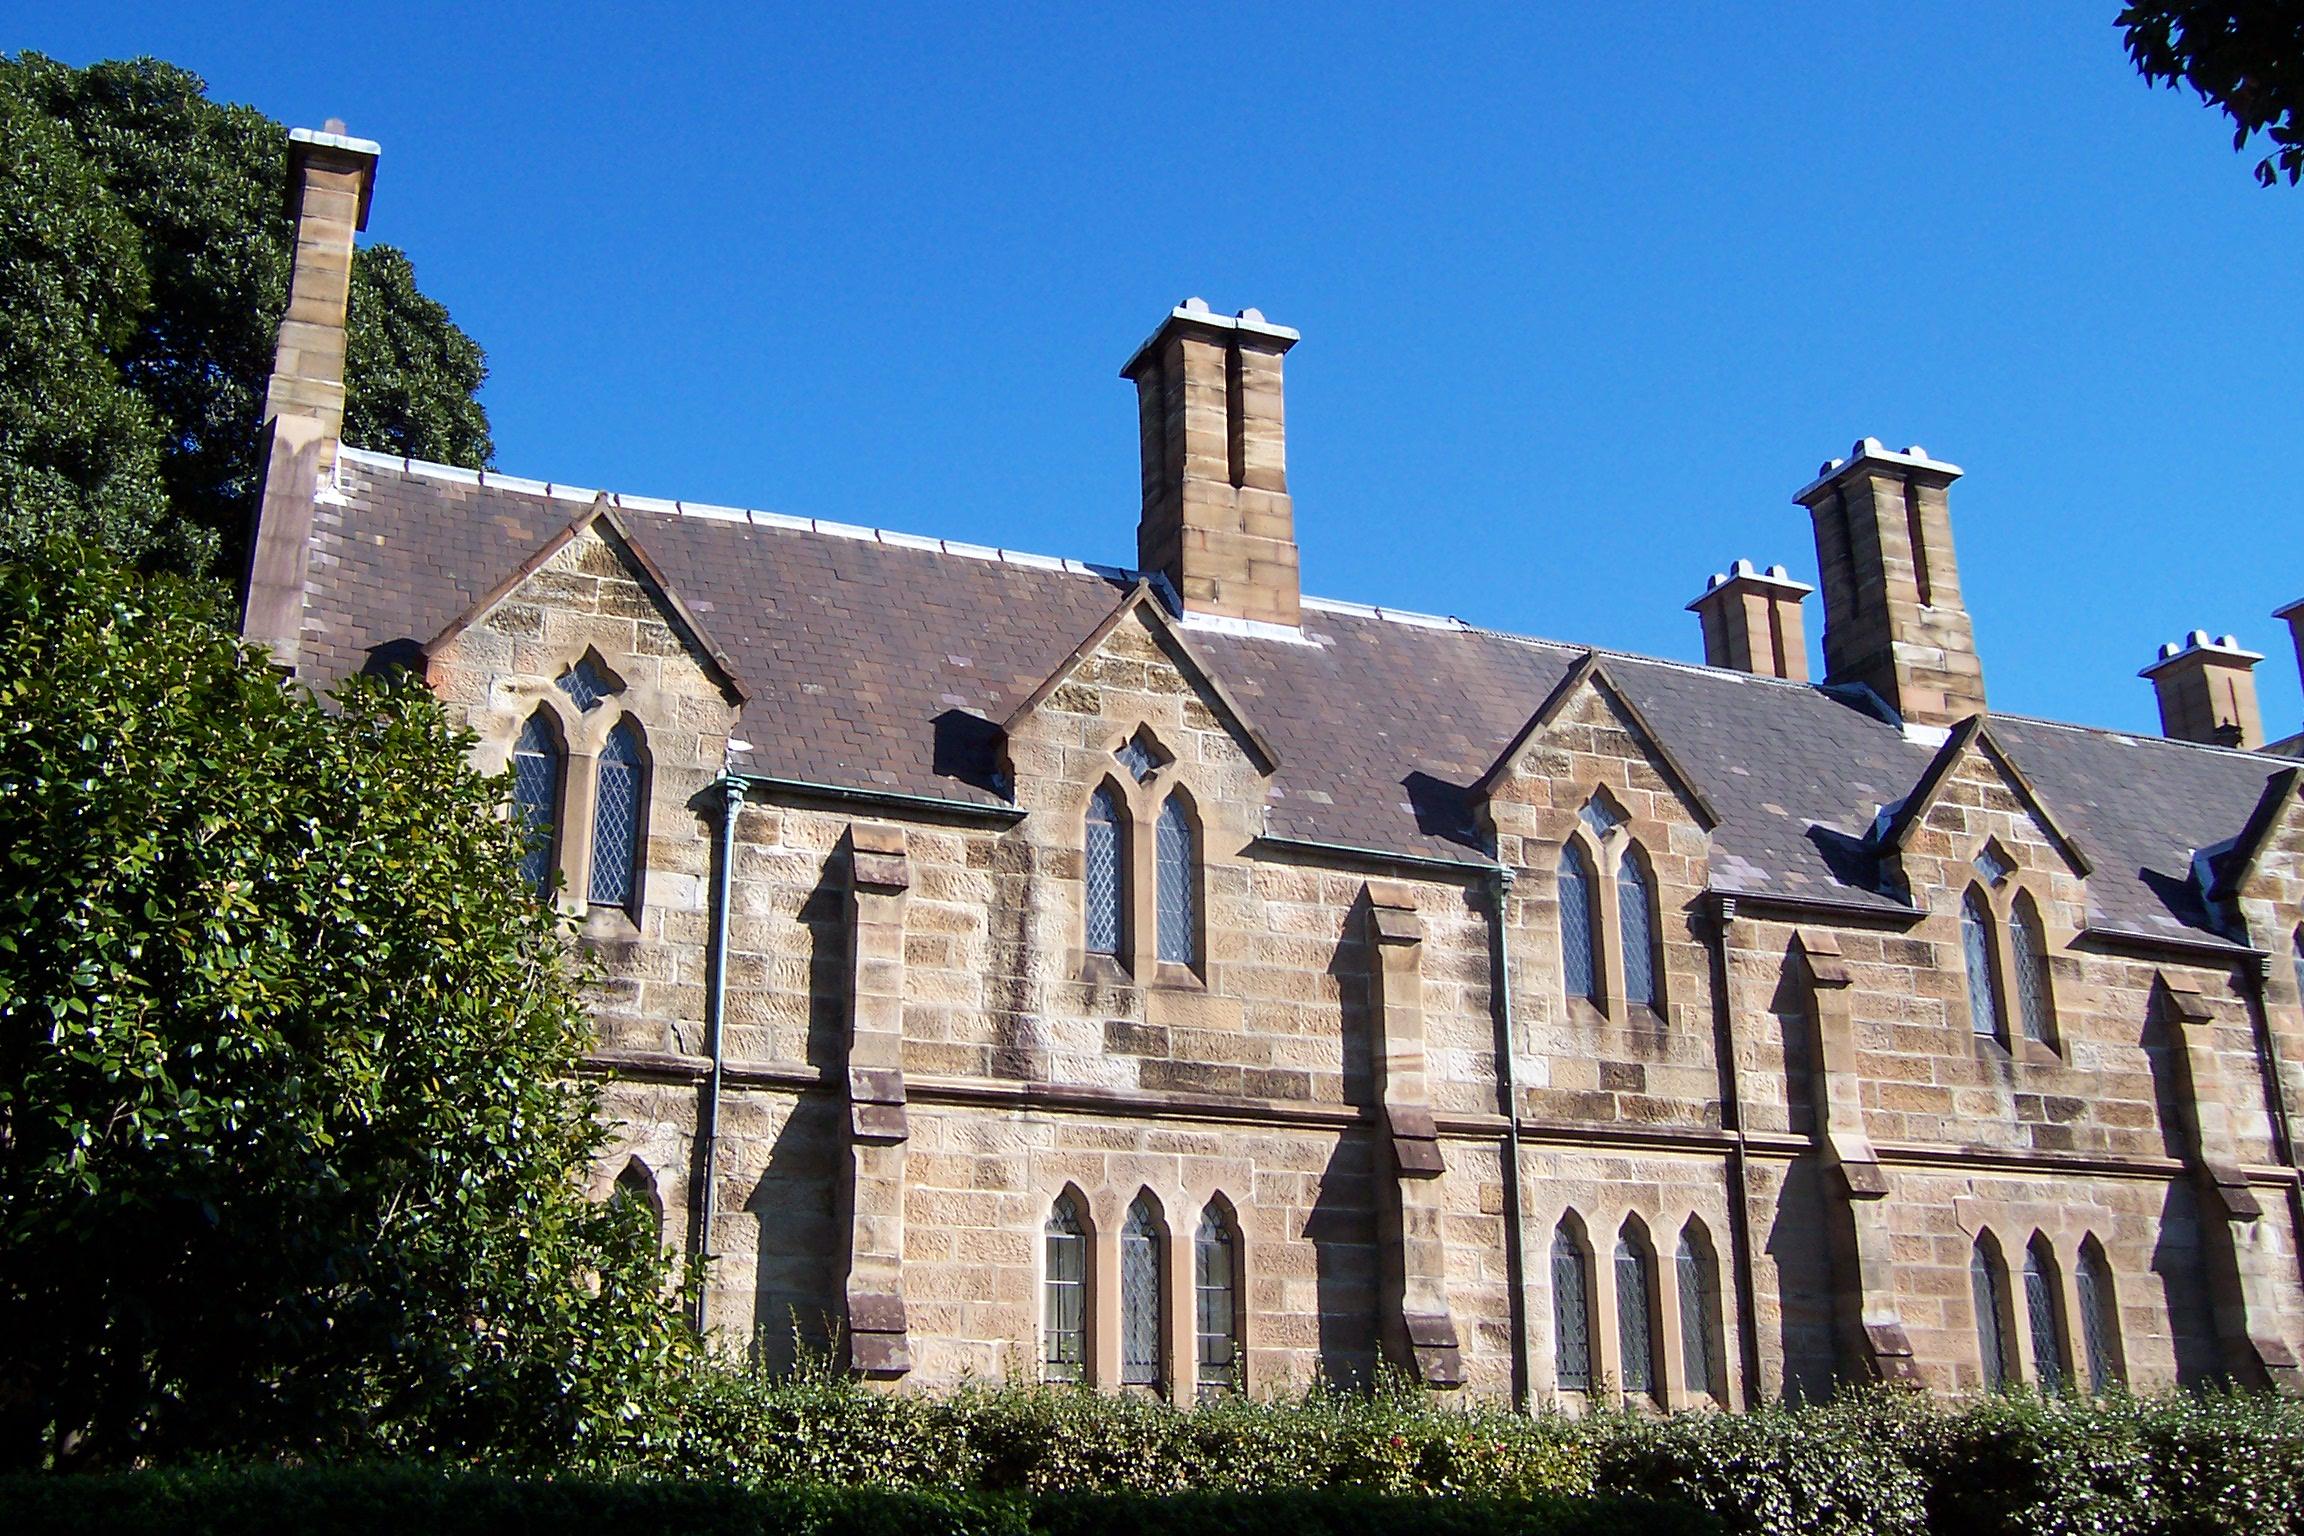 Pauls College, The University of Sydney